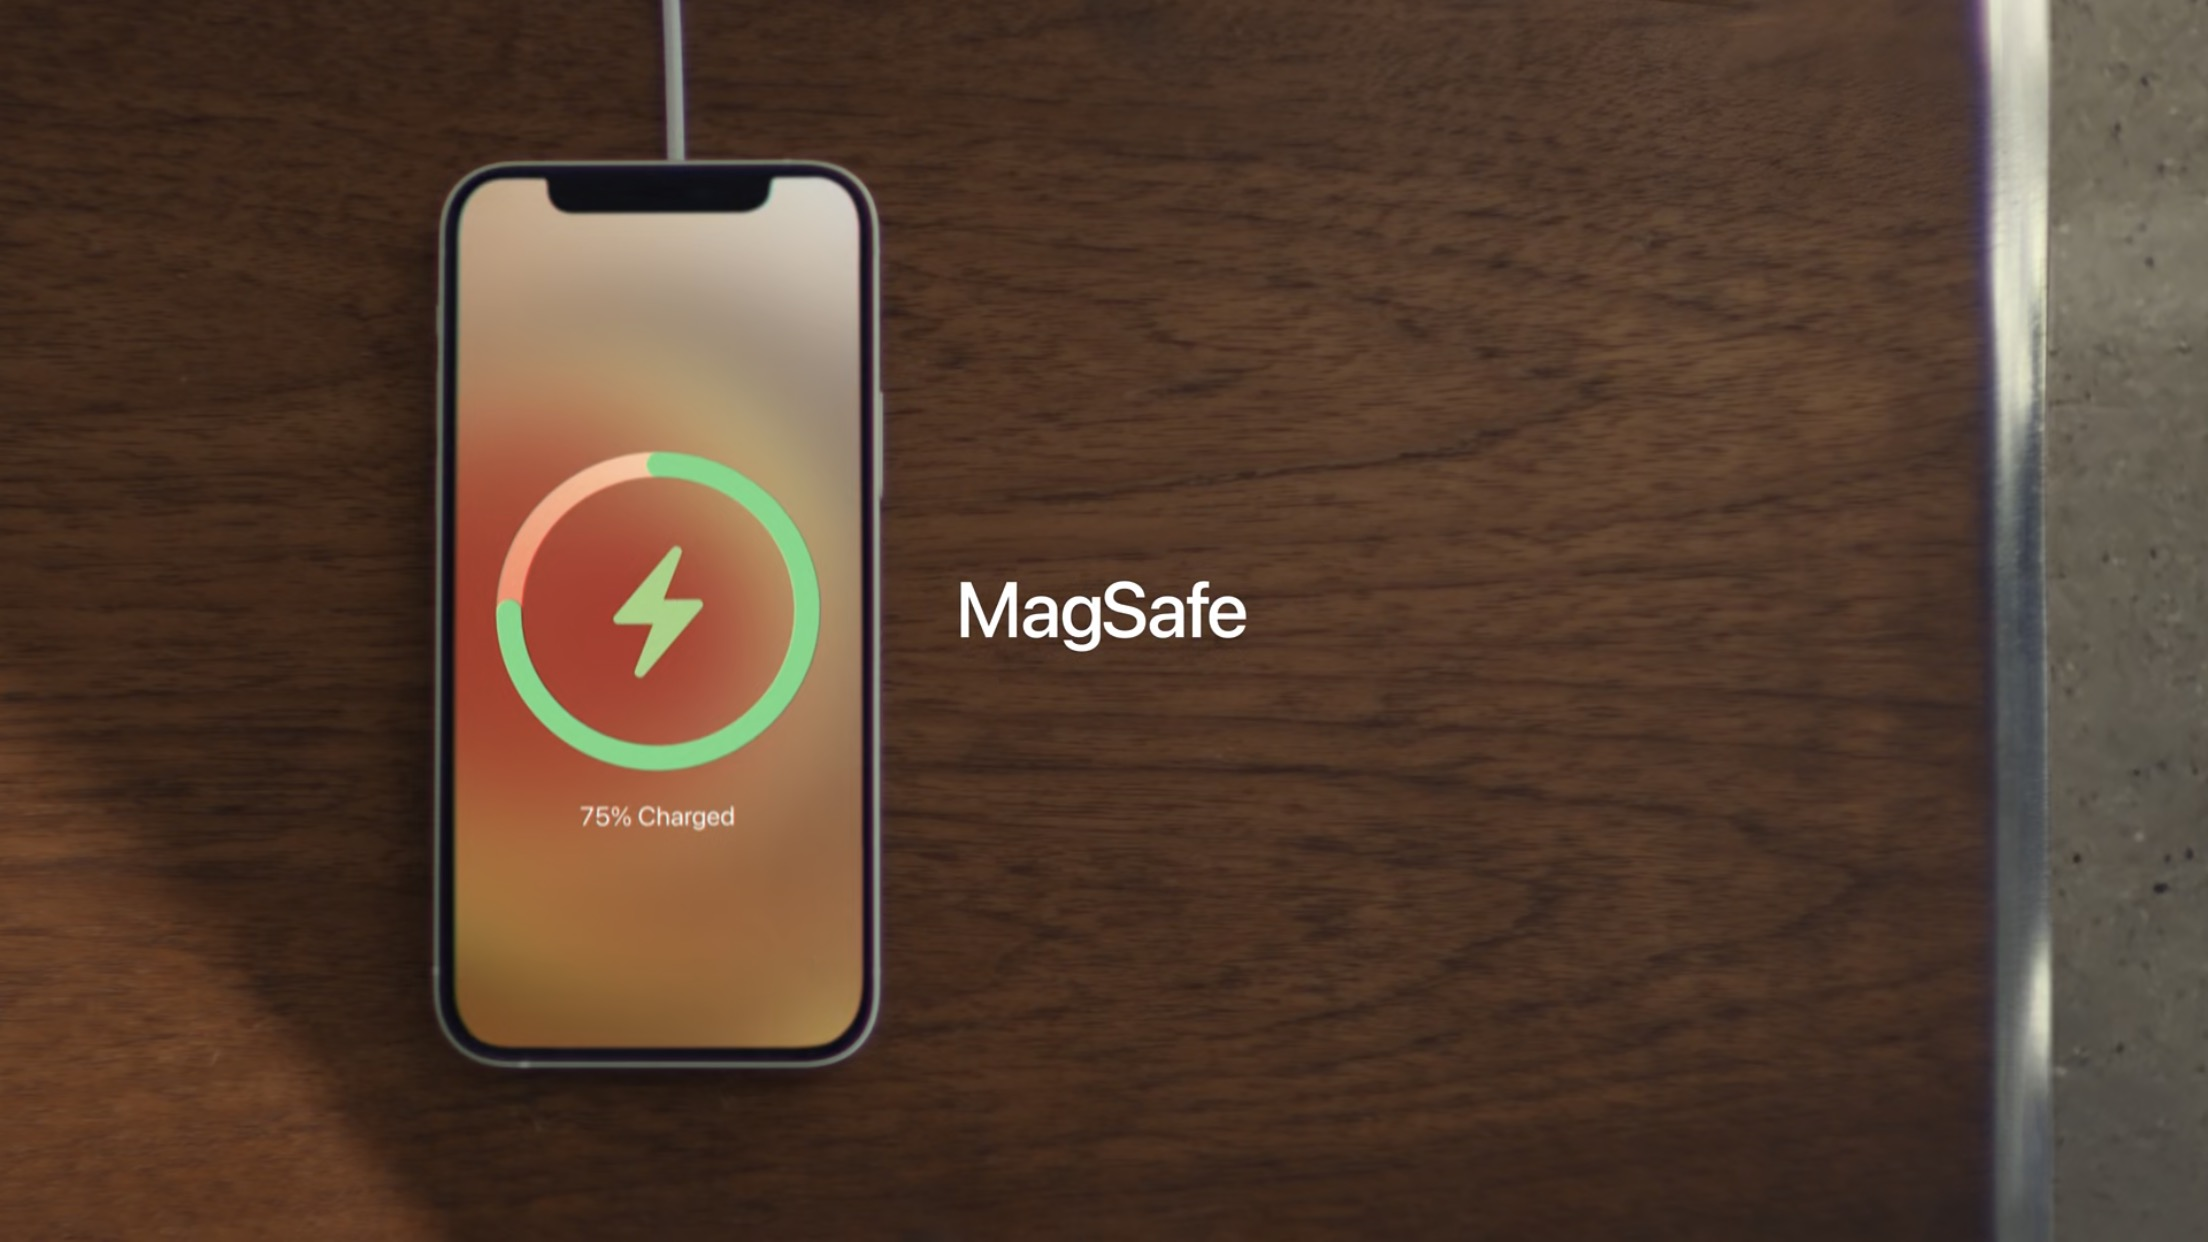 「MagSafe」、15W出力のワイヤレス充電器などアクセサリとして復活